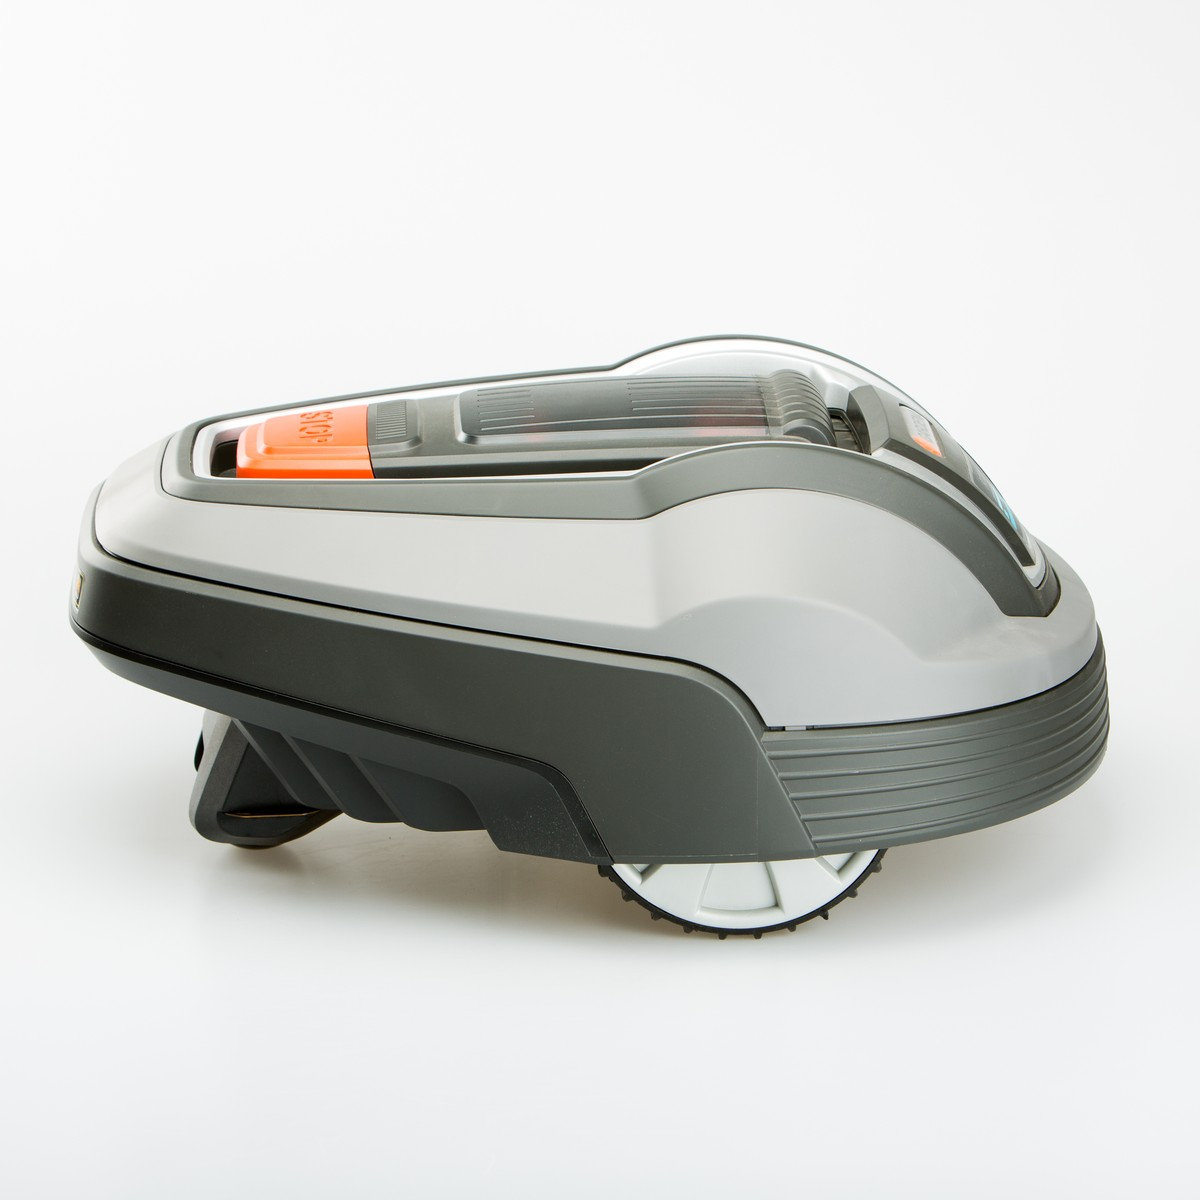 tondeuse robo r70li 780x520x370mm | schilliger